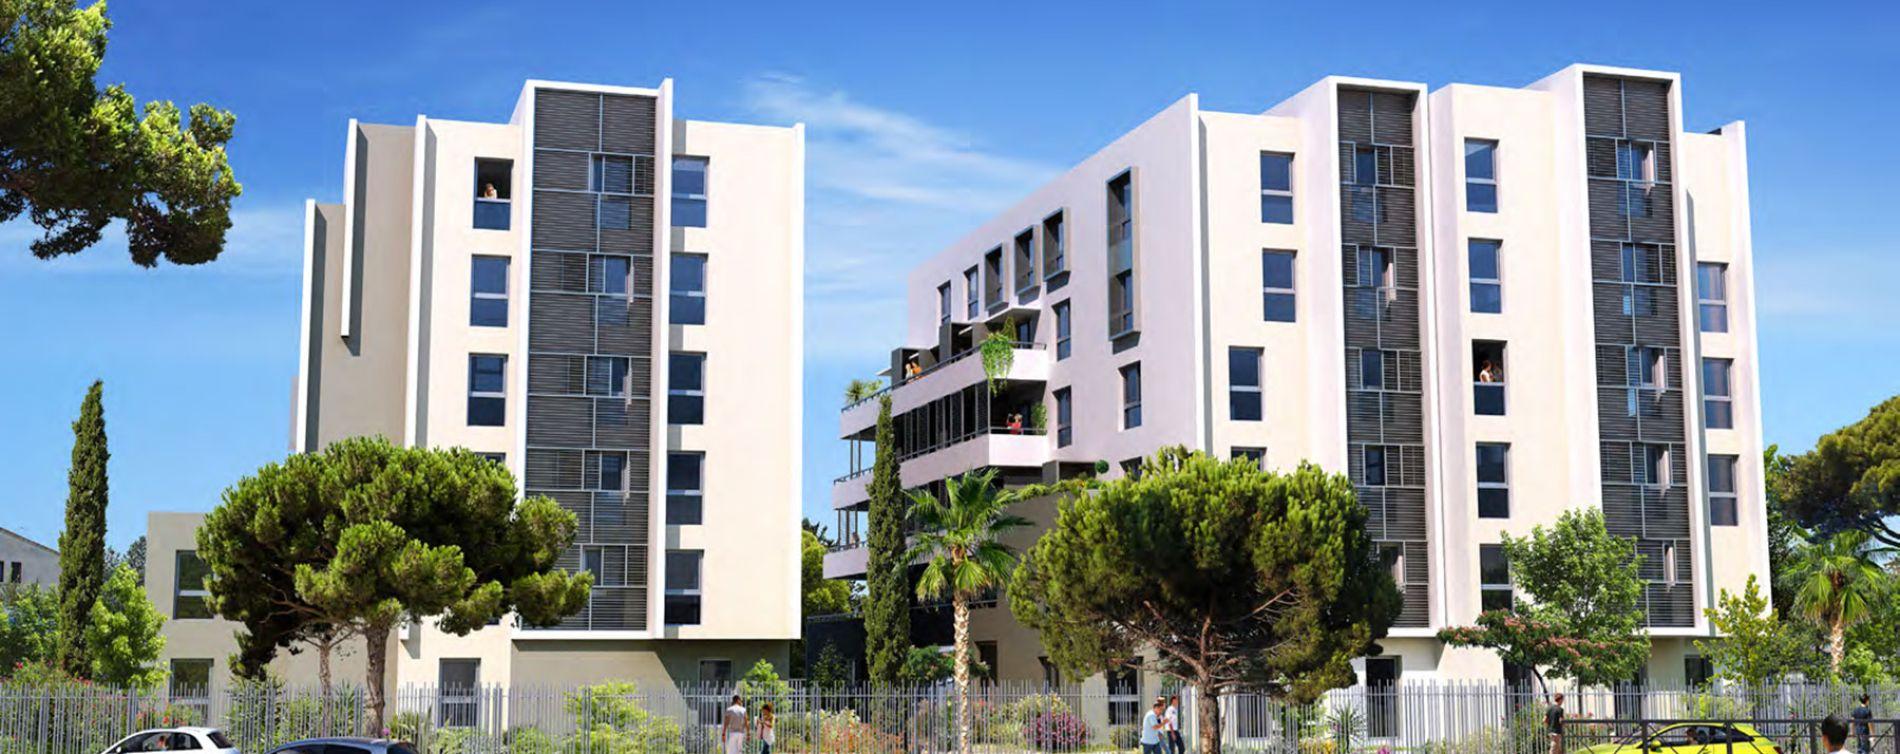 Montpellier : programme immobilier neuve « Fac Story »